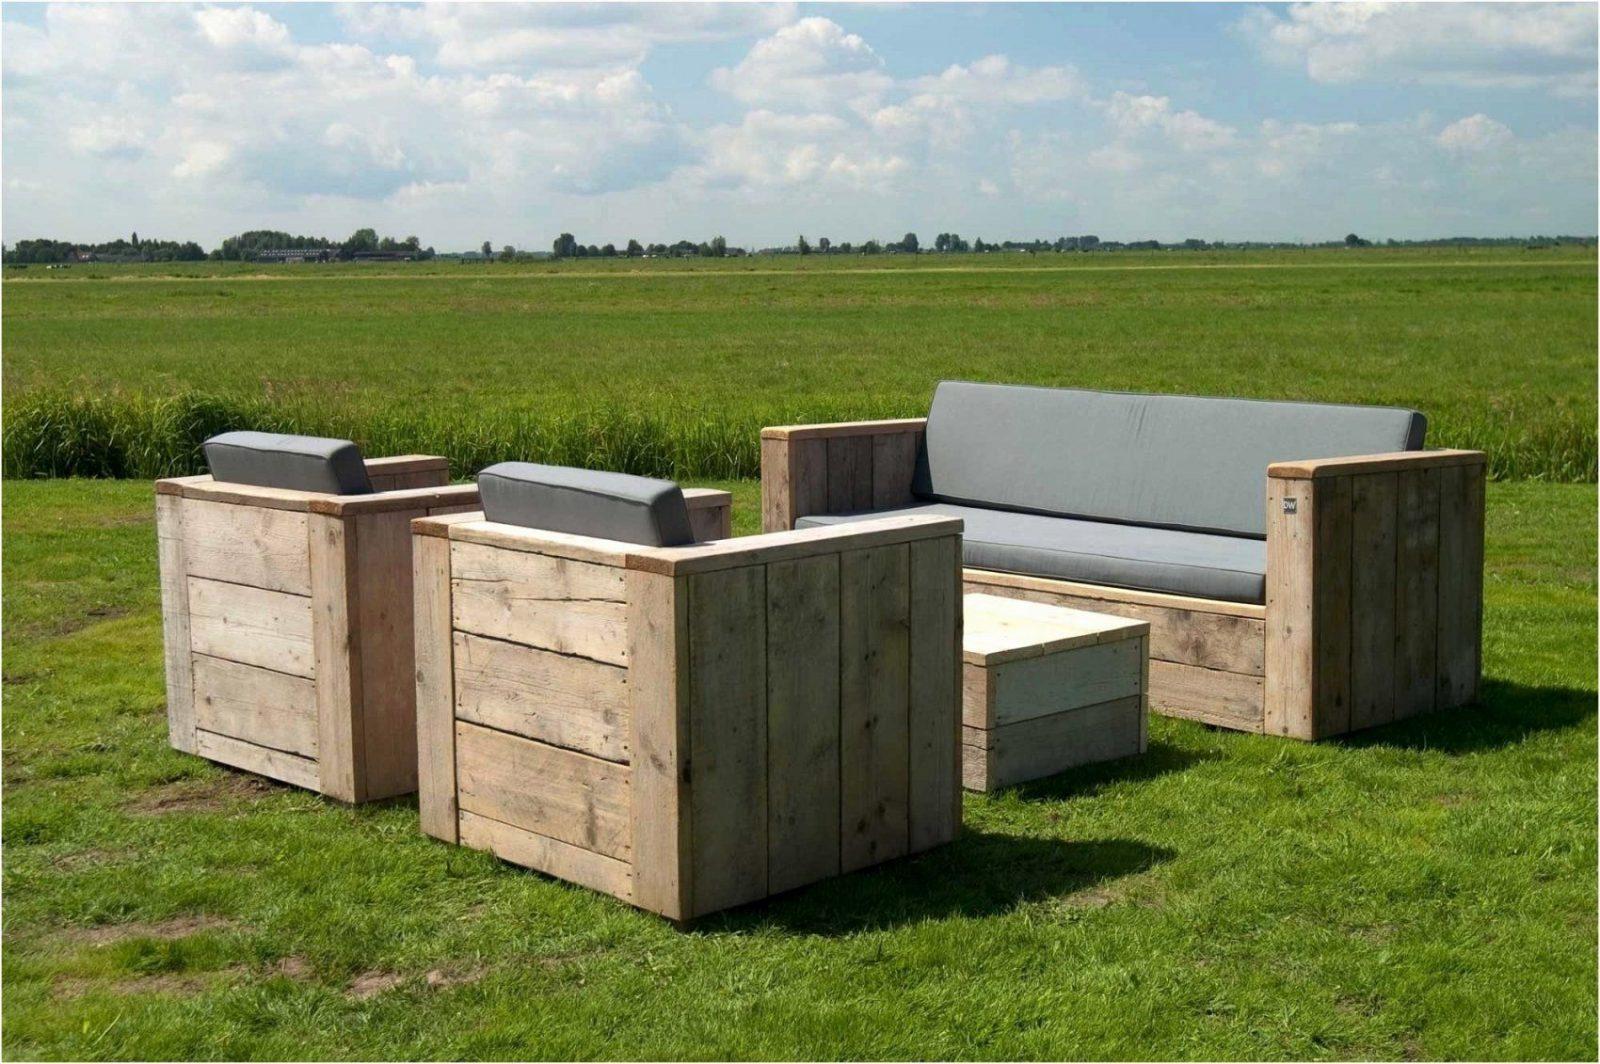 Inspirational Holz Gartenliege Selber Bauen Amazing Gartenliege von Holz Gartenliege Selber Bauen Bild